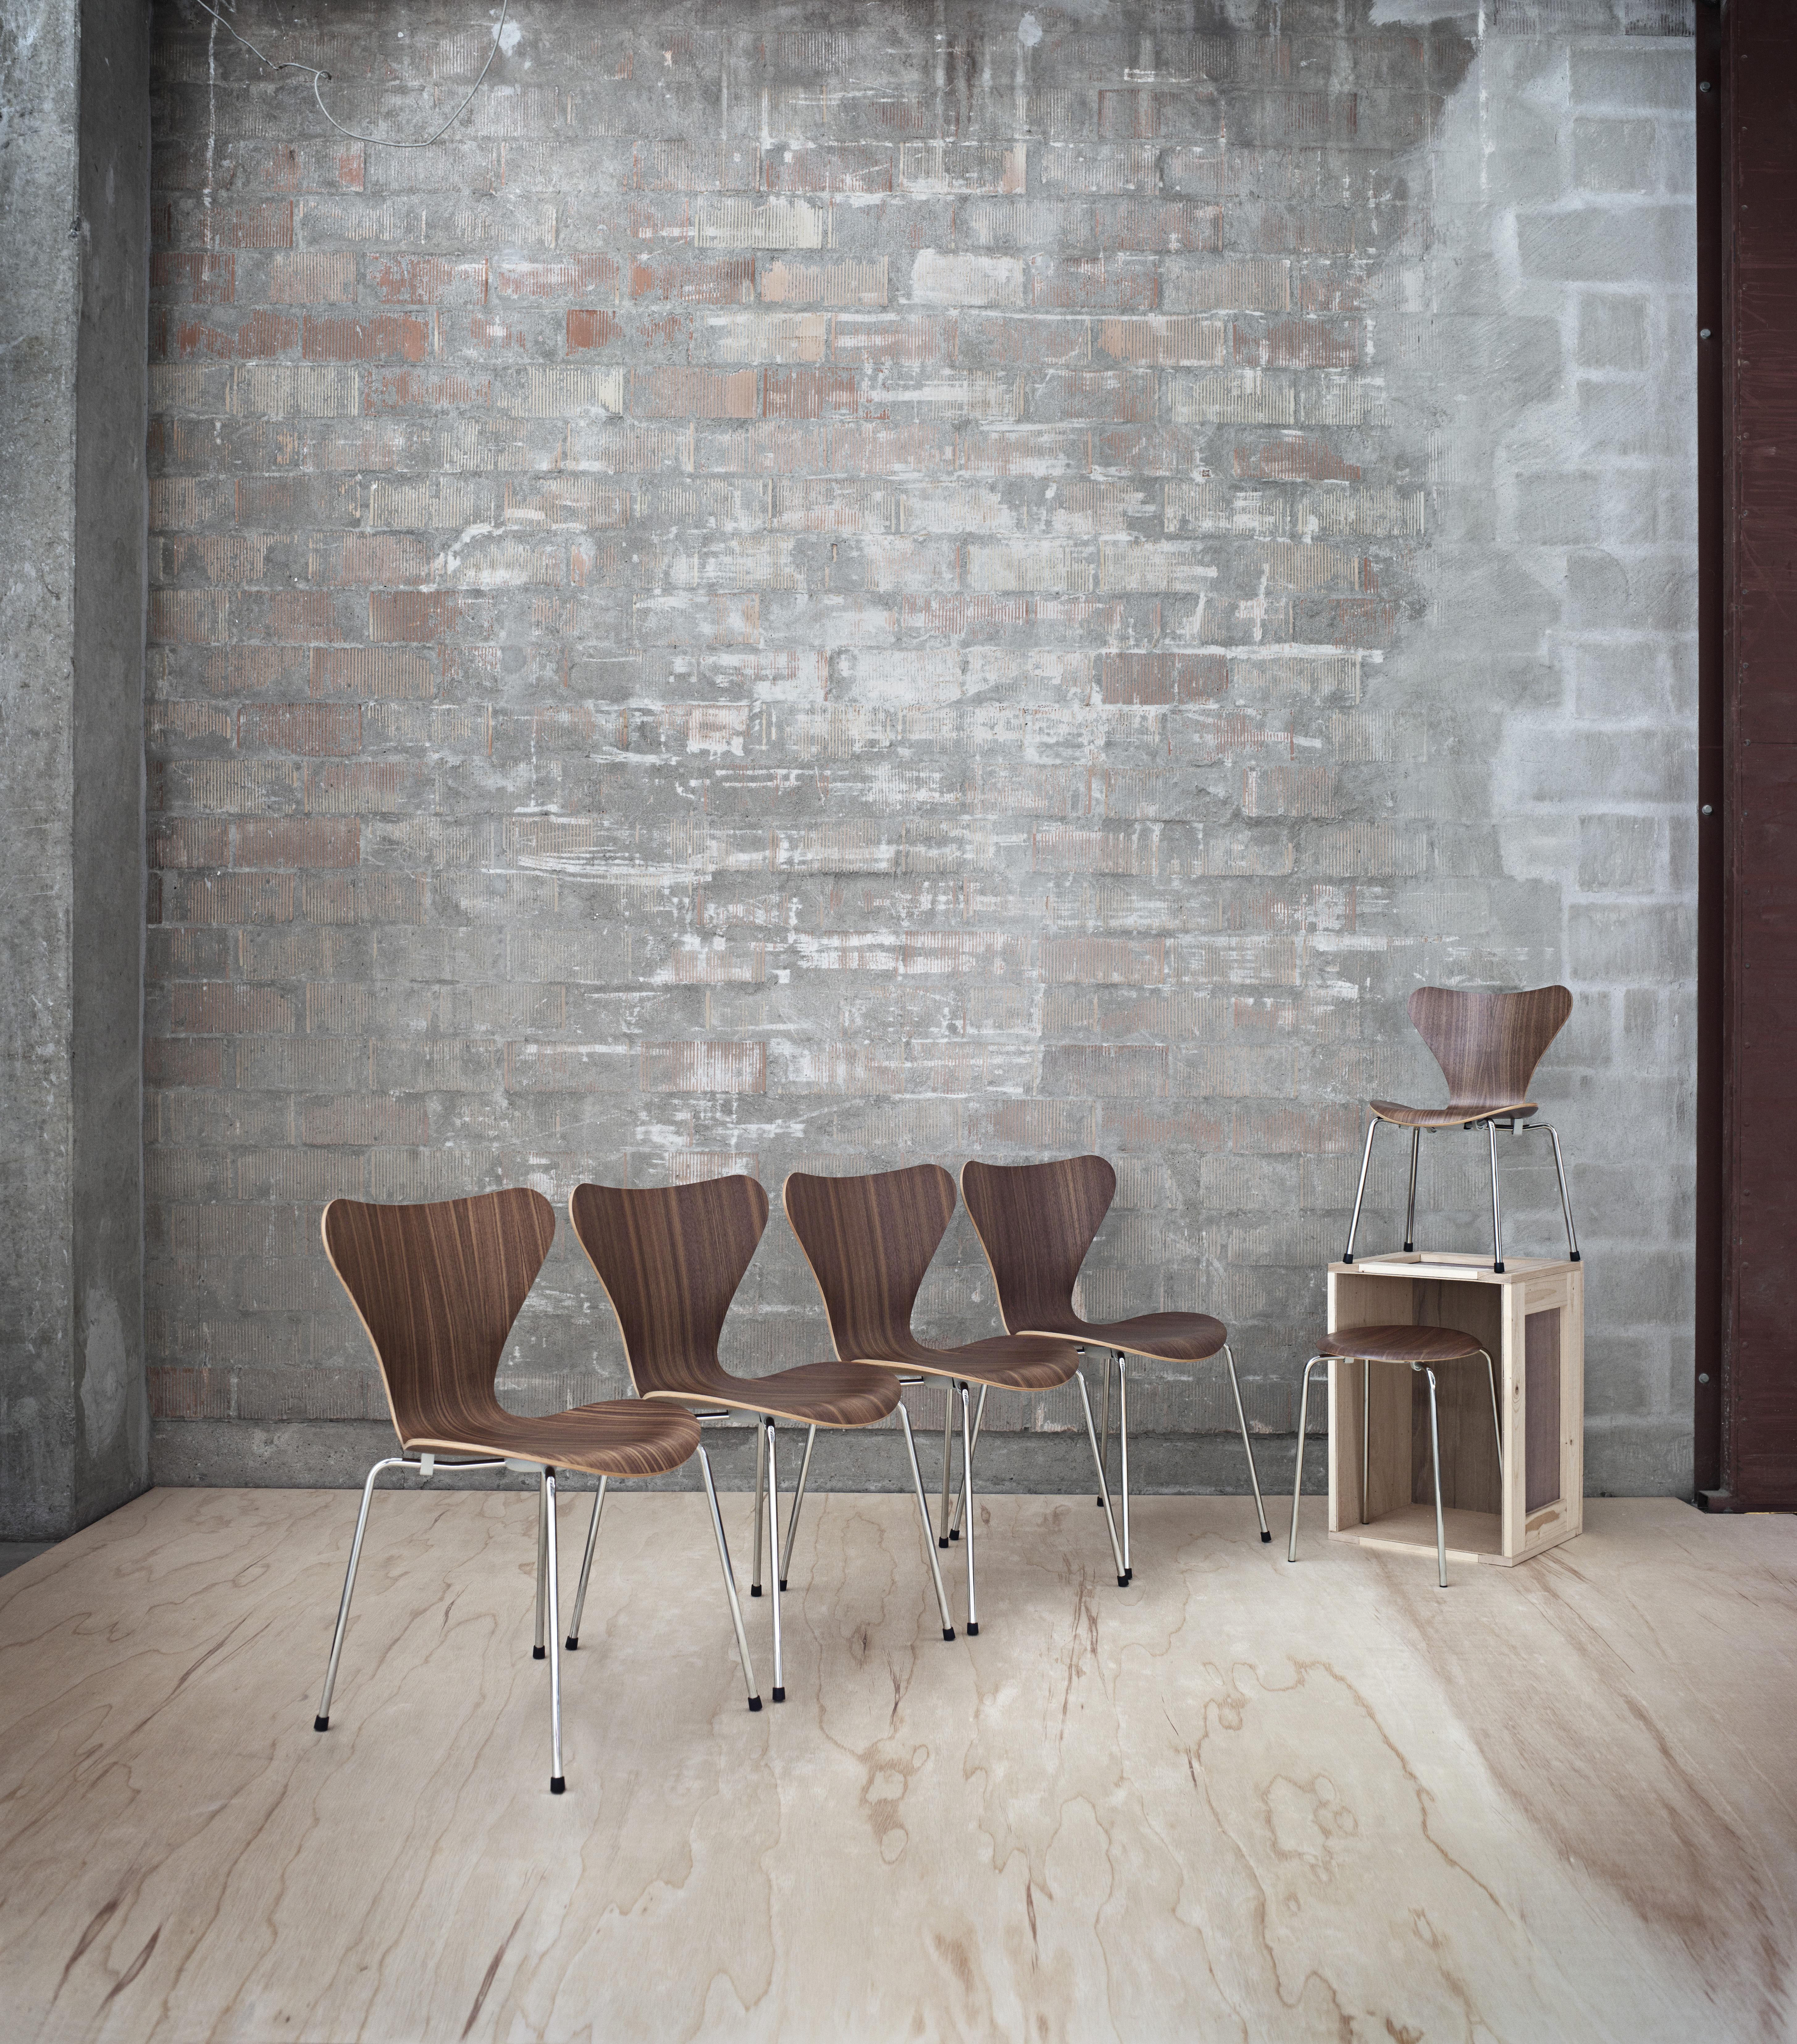 dot h 44 cm esche get nt fritz hansen niedriger hocker. Black Bedroom Furniture Sets. Home Design Ideas